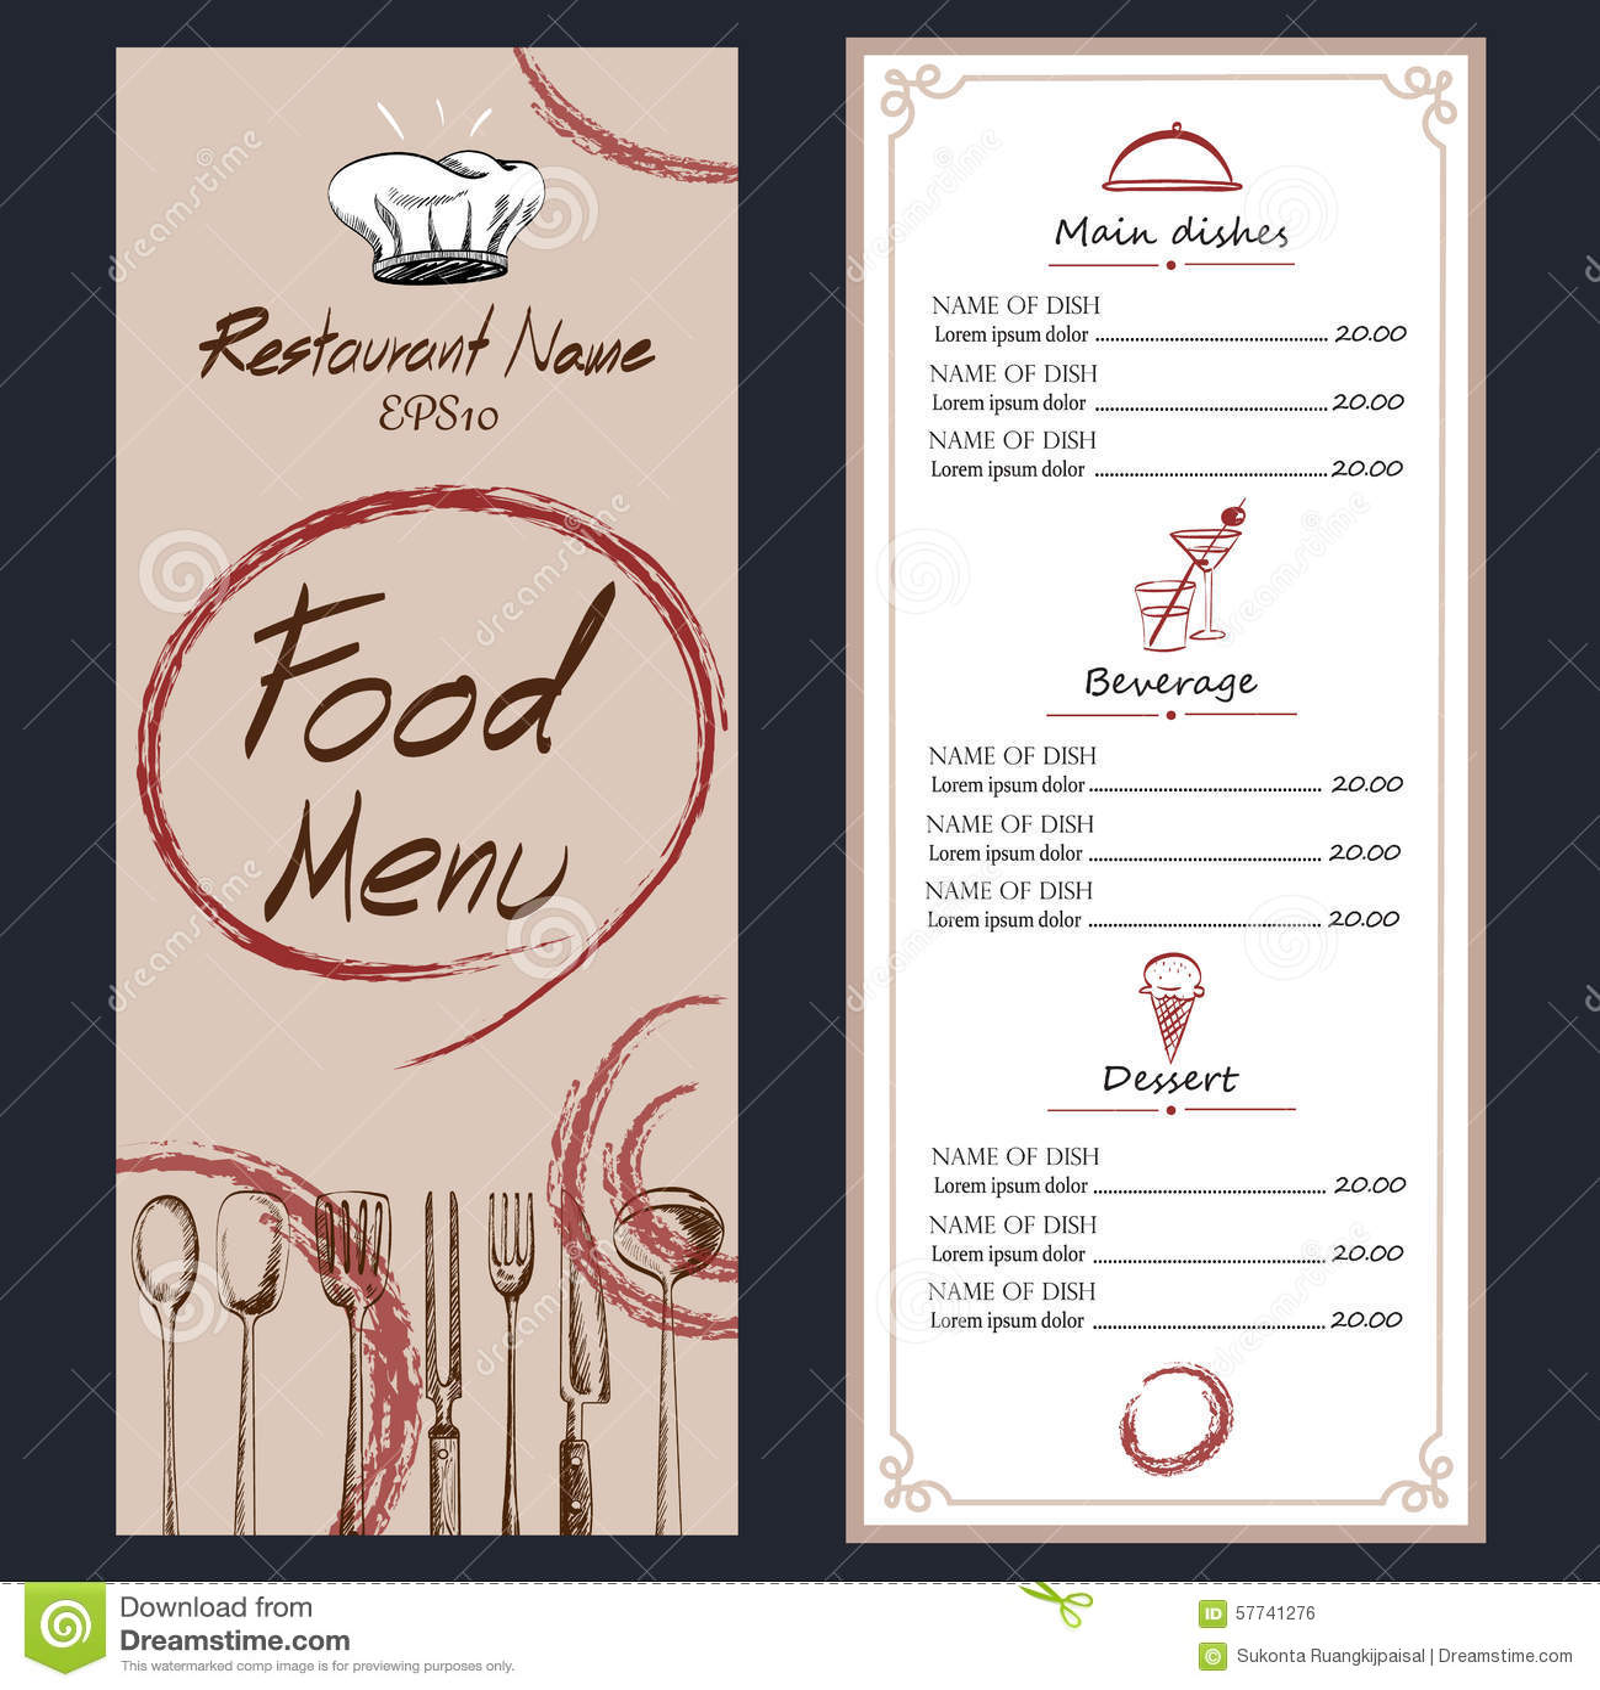 menu brochure template - food menu cafe brochure drawing template stock vector